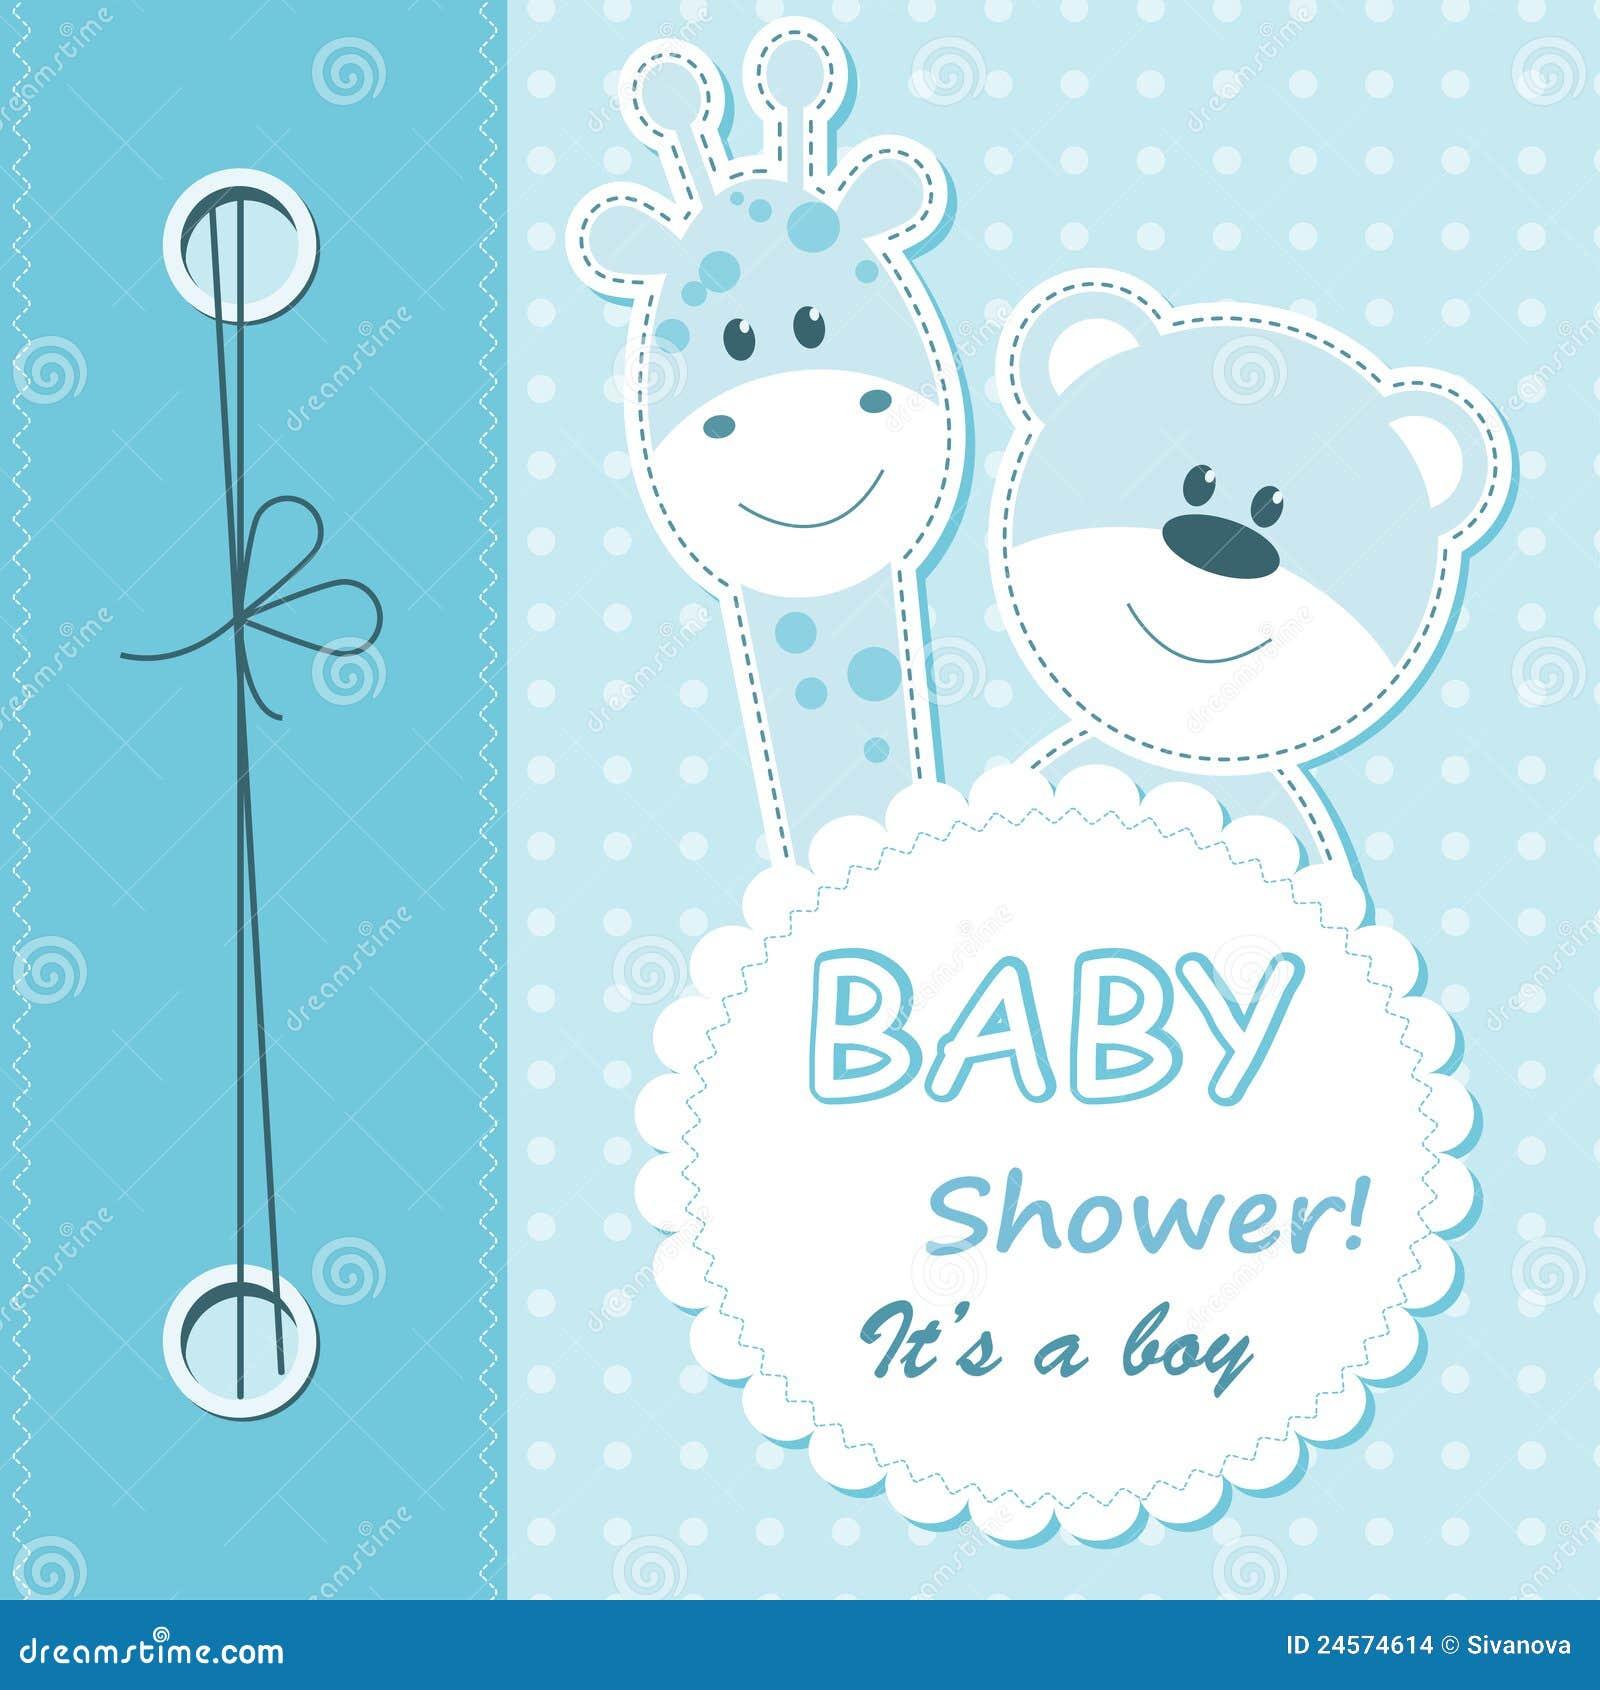 Vector Baby Boy Scrapbook Card Stock Images - Image: 24574614